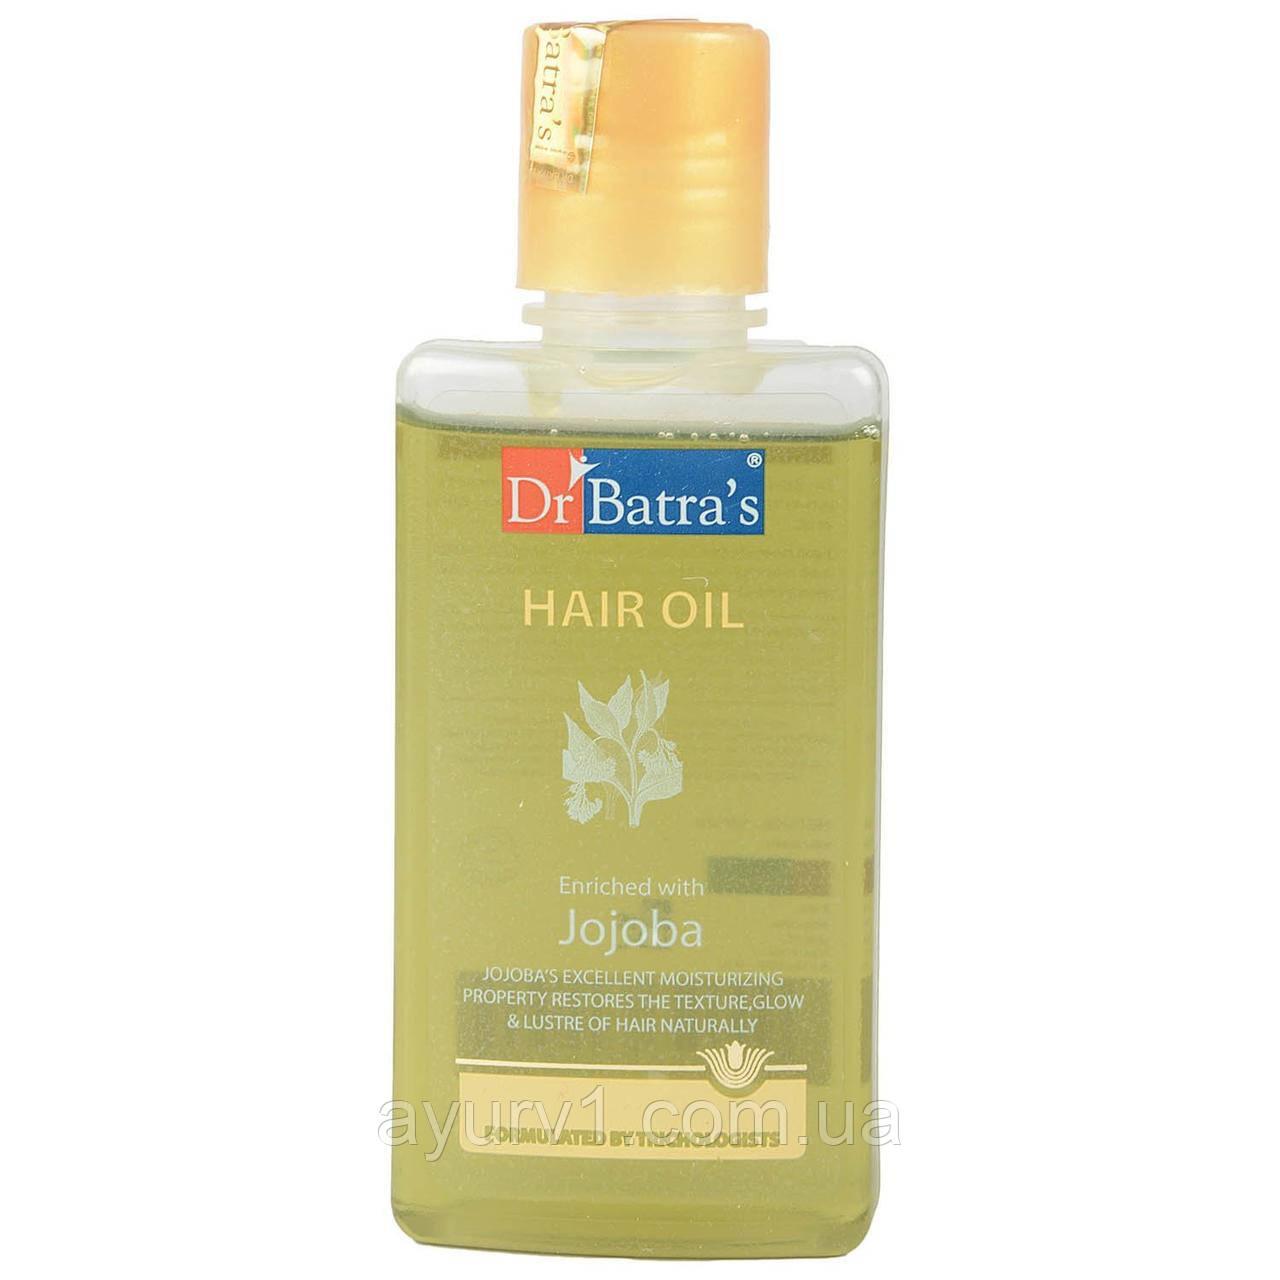 Масло для волос Жожоба Др. Батра  / Hair oil with Jojoba Dr.batra / - 200 мл.